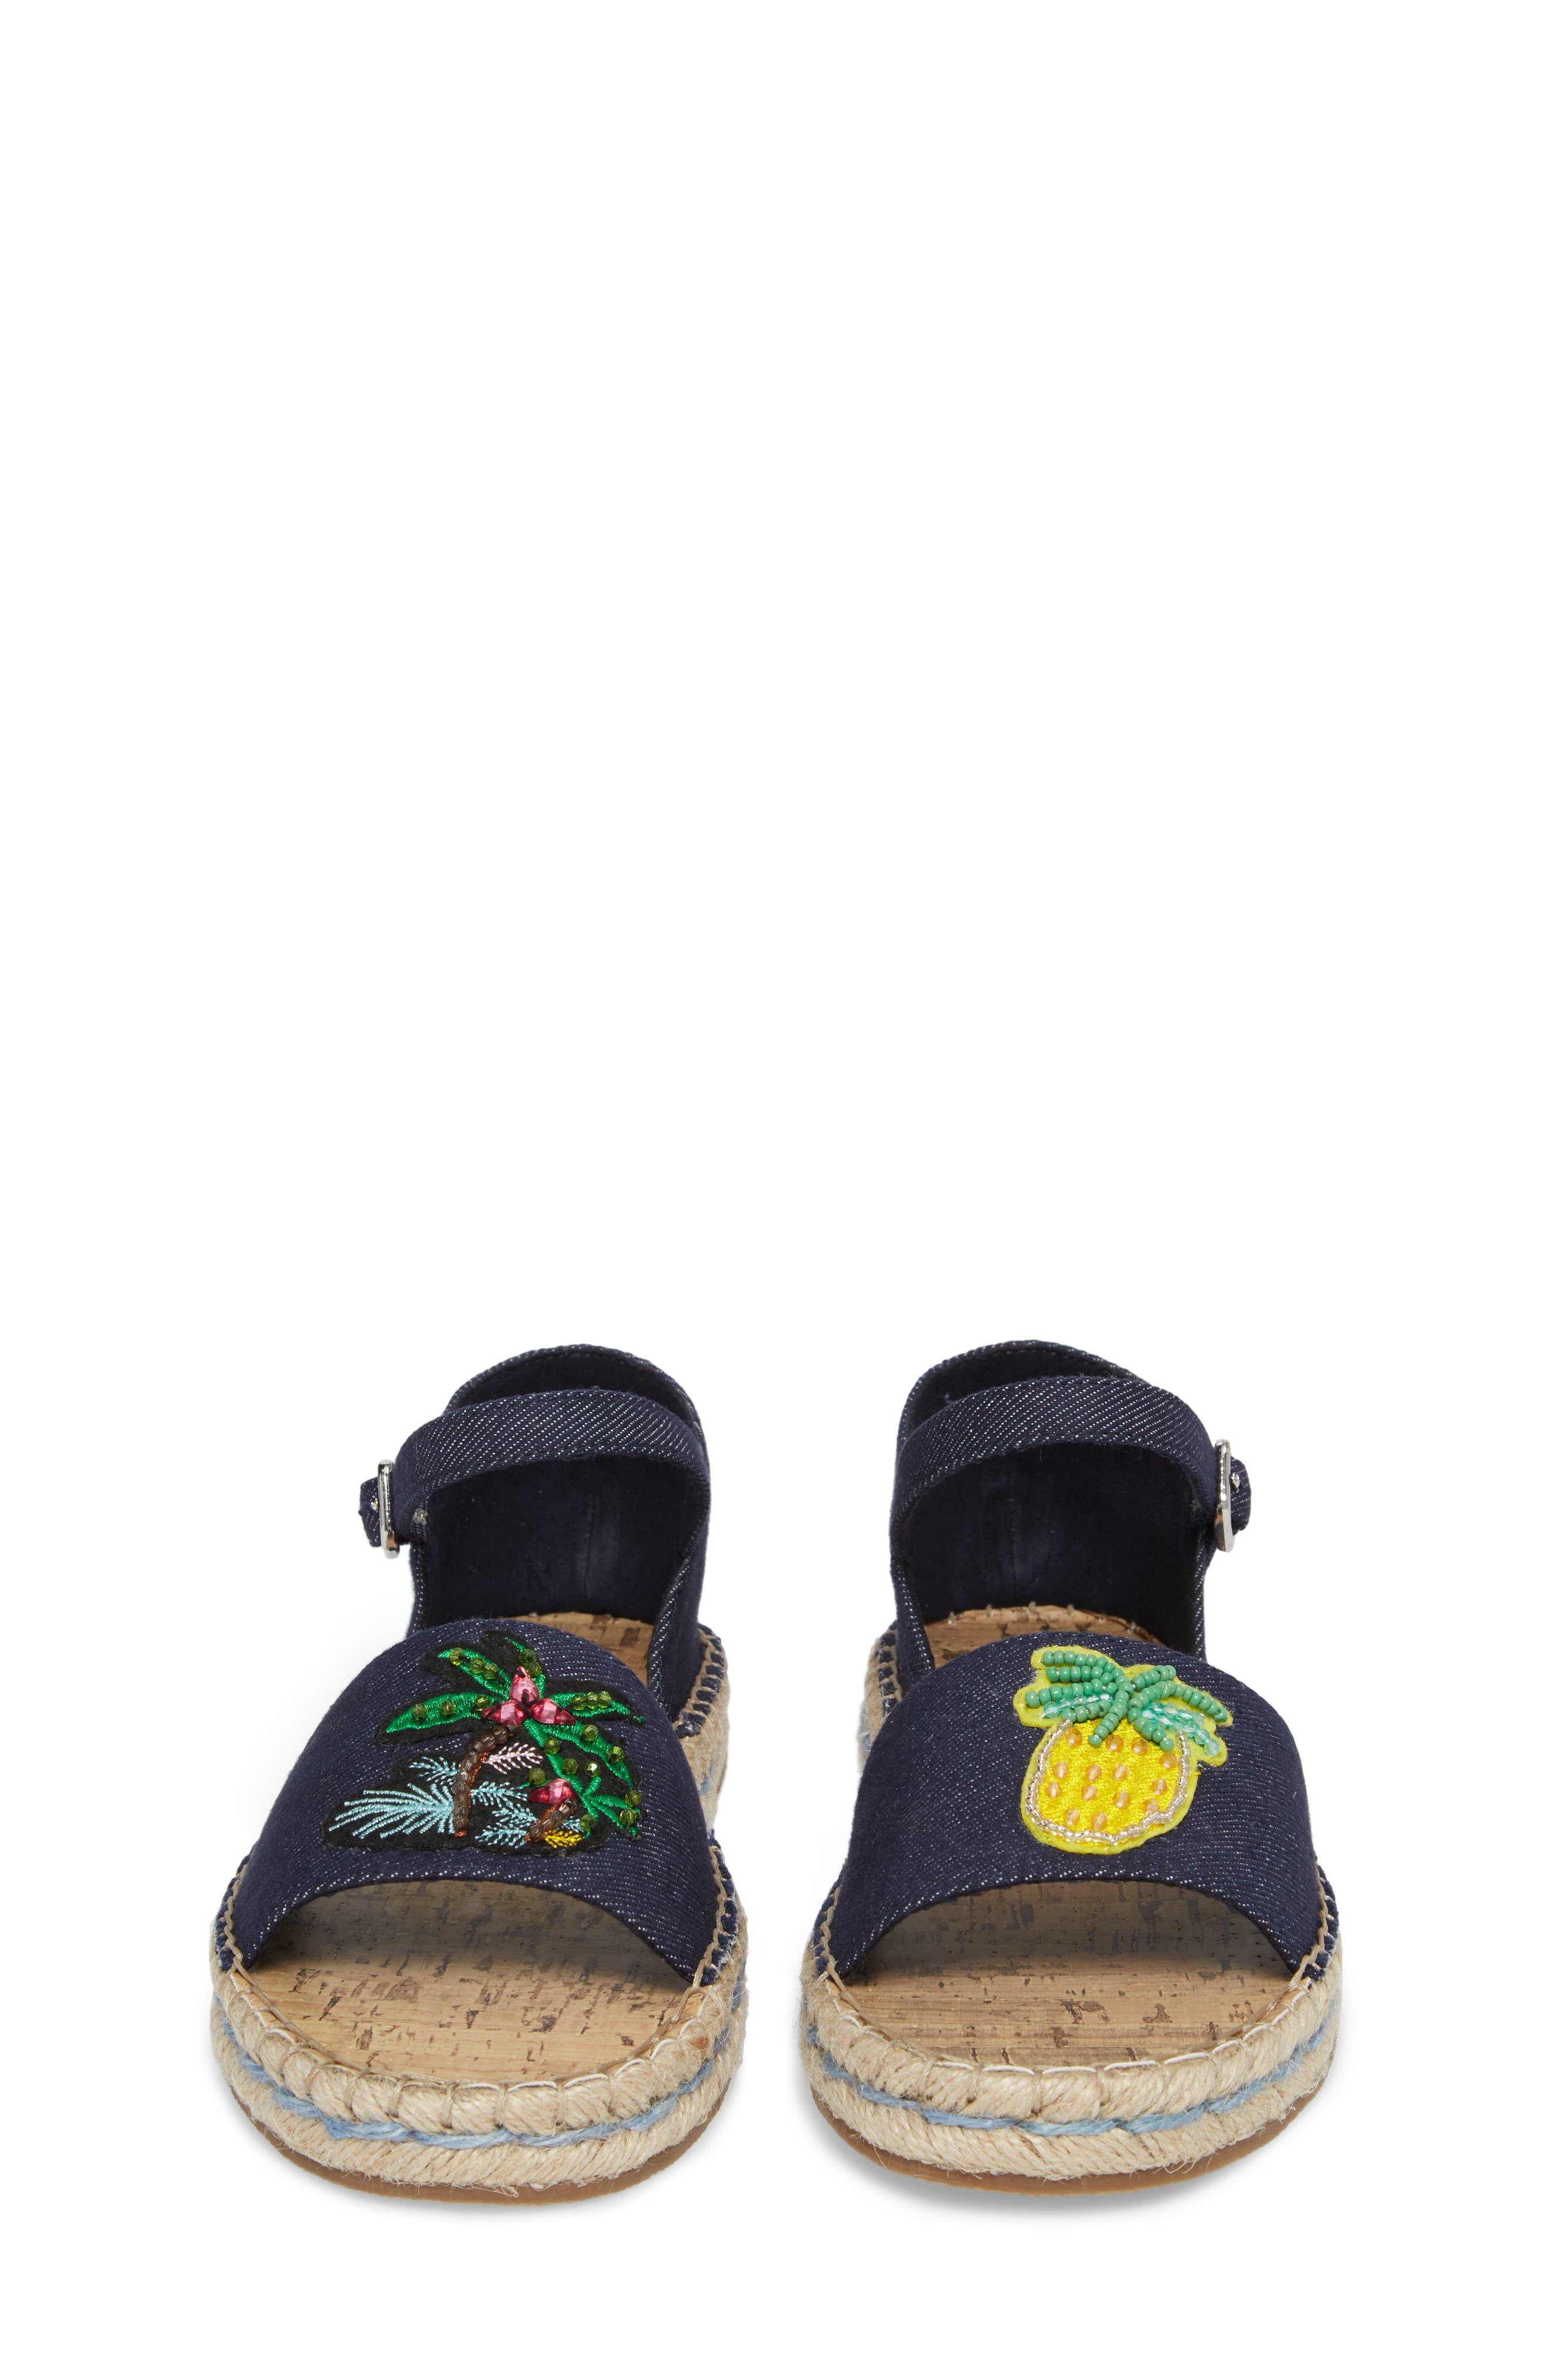 JLUAO Tropical Embellished Sandal,                             Alternate thumbnail 5, color,                             001